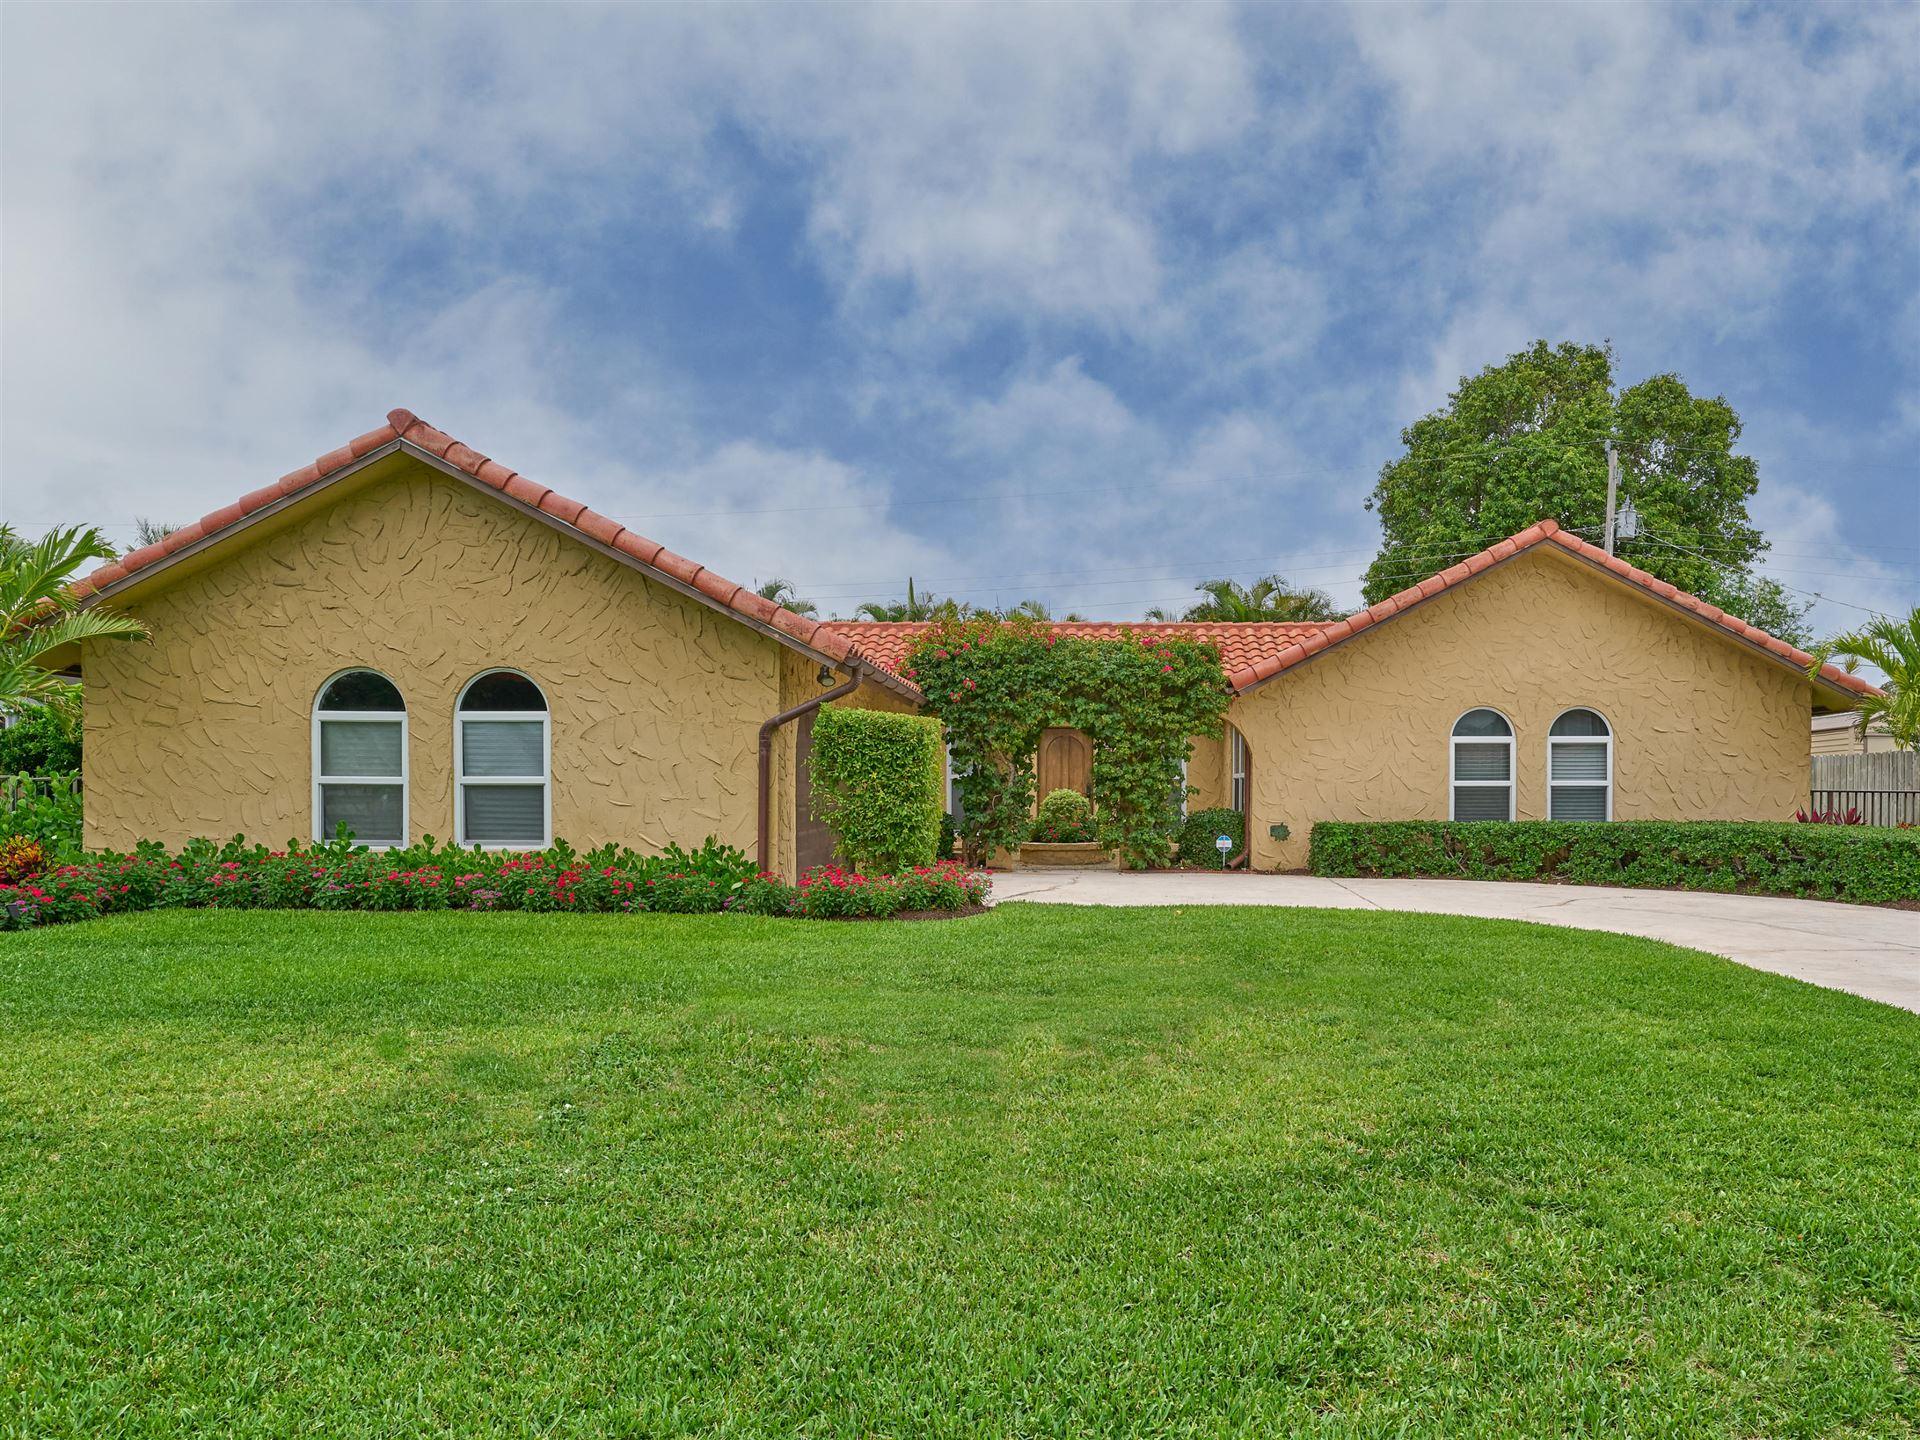 451 Denny Court, Boca Raton, FL 33486 - #: RX-10725448